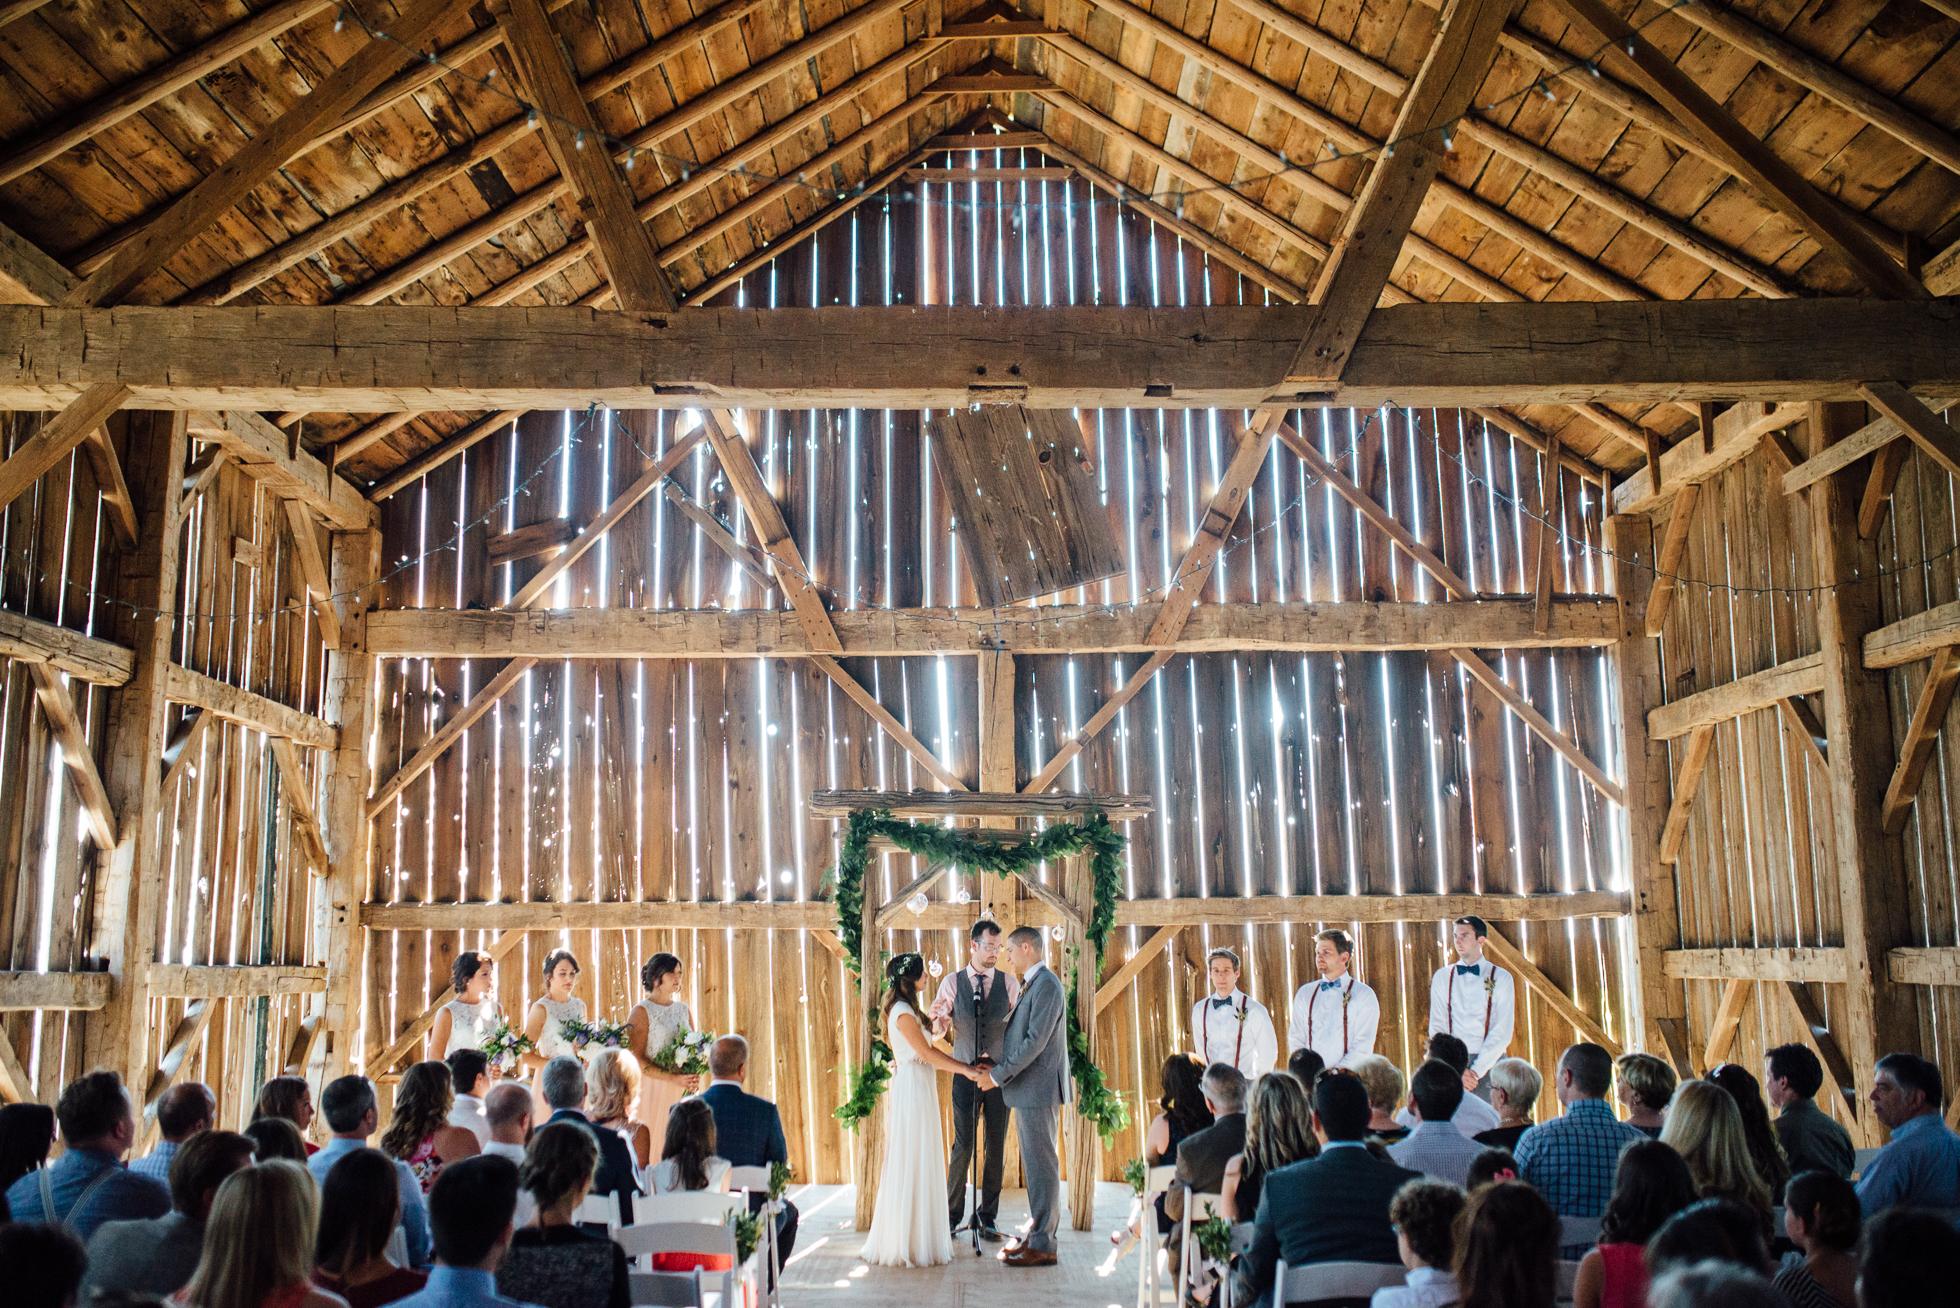 Downswell-Barn-Wedding-Photography-41.jpg